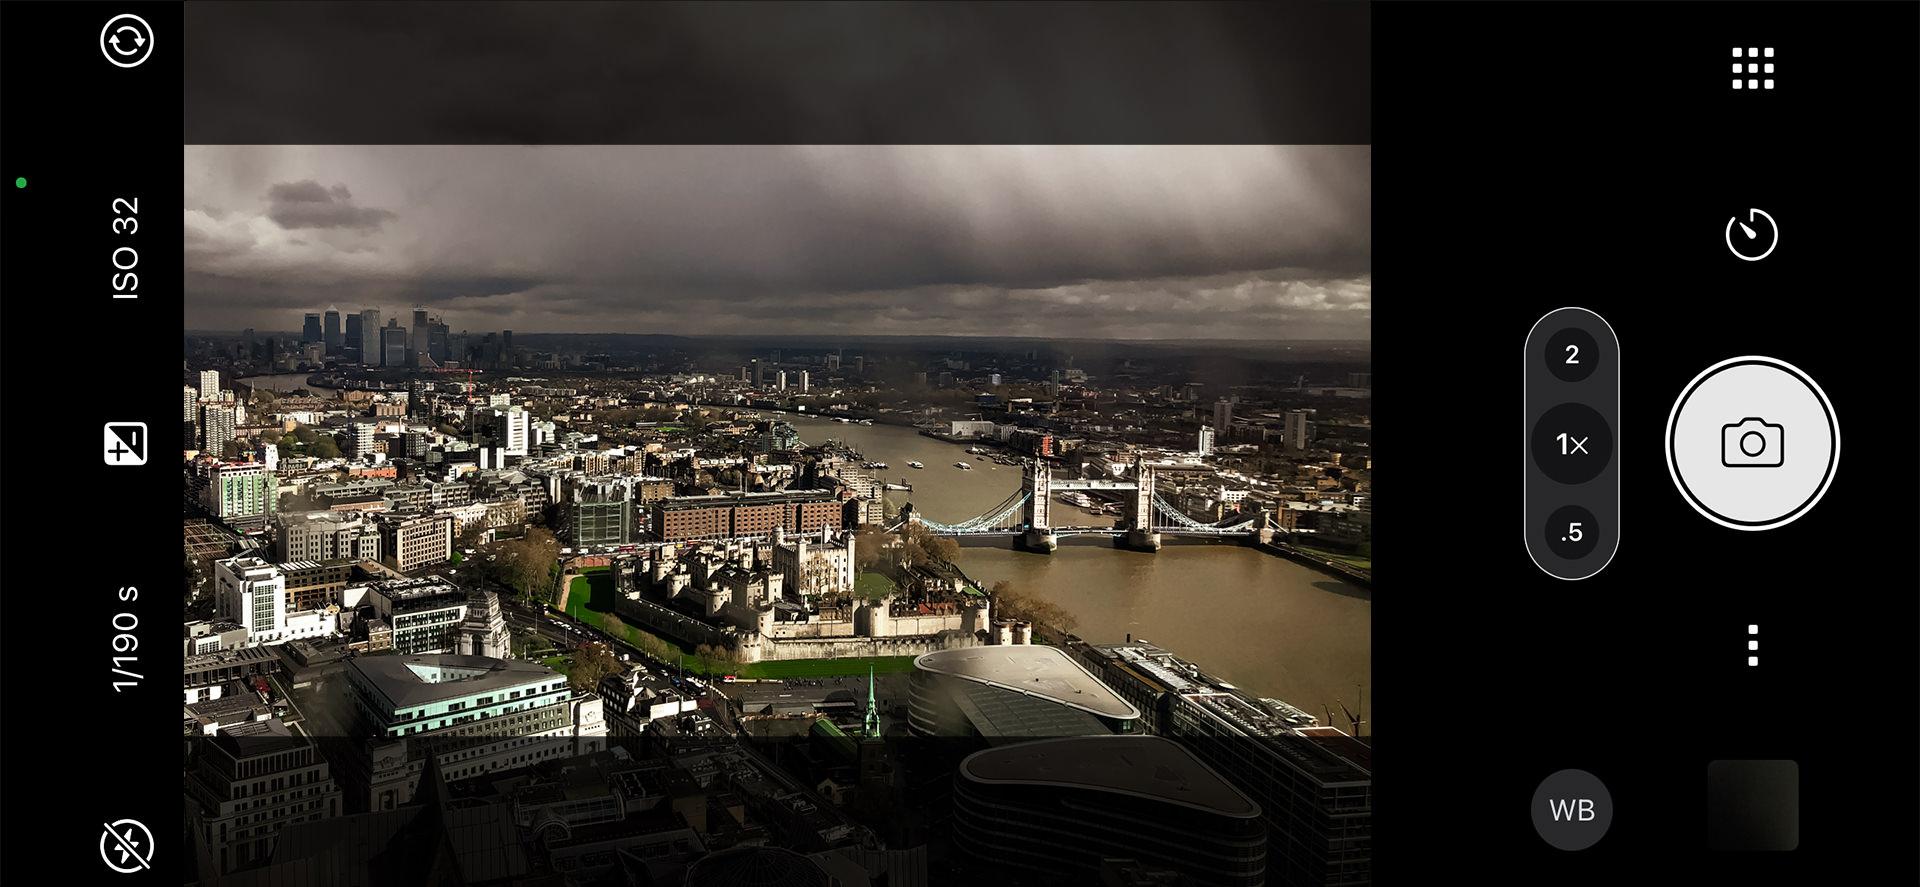 Widescreen 2:1 Panorama Format